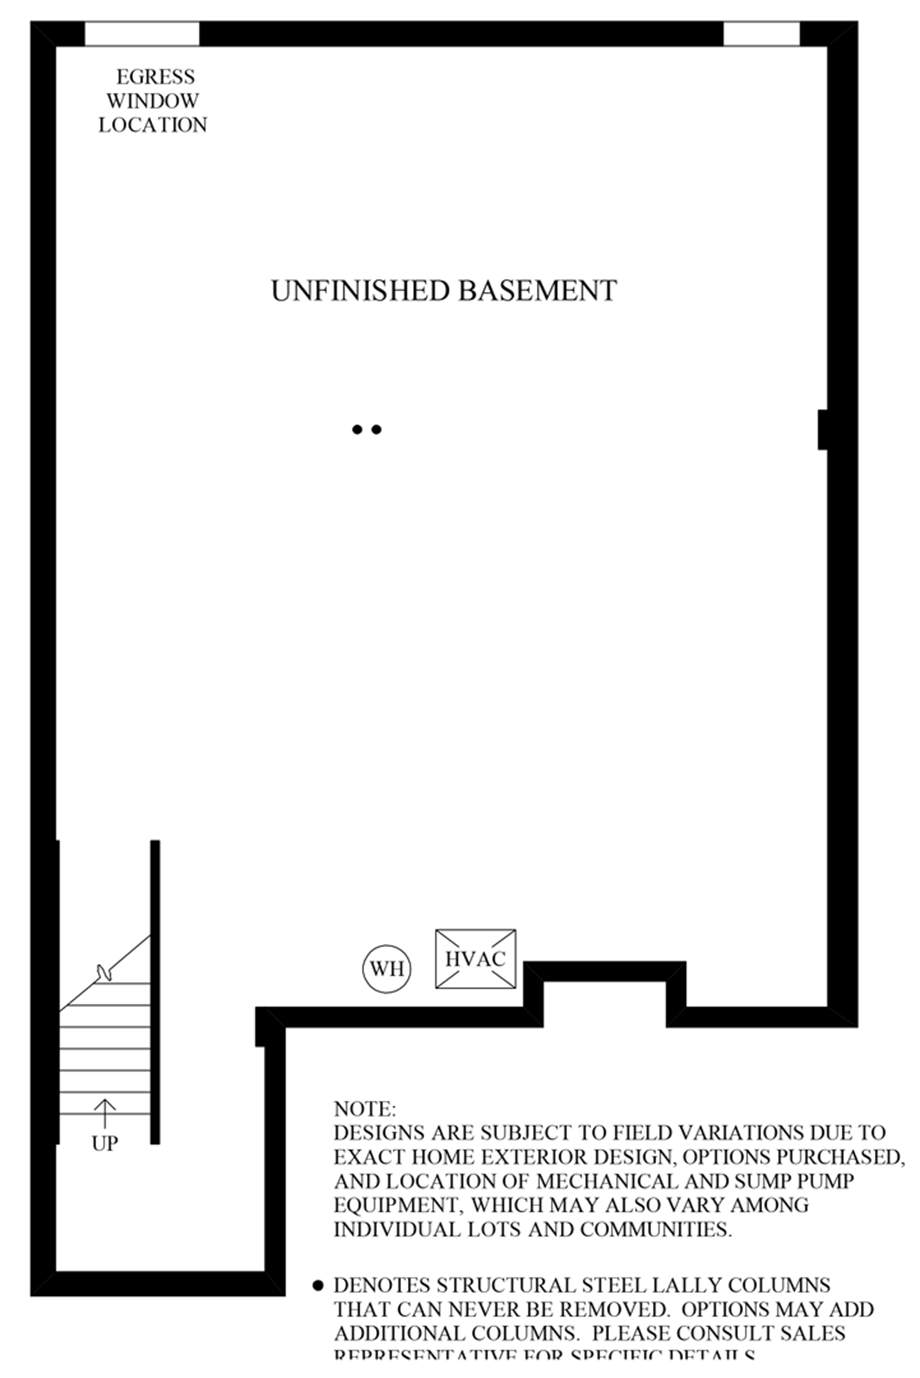 Unfinished Basement Floor Plan